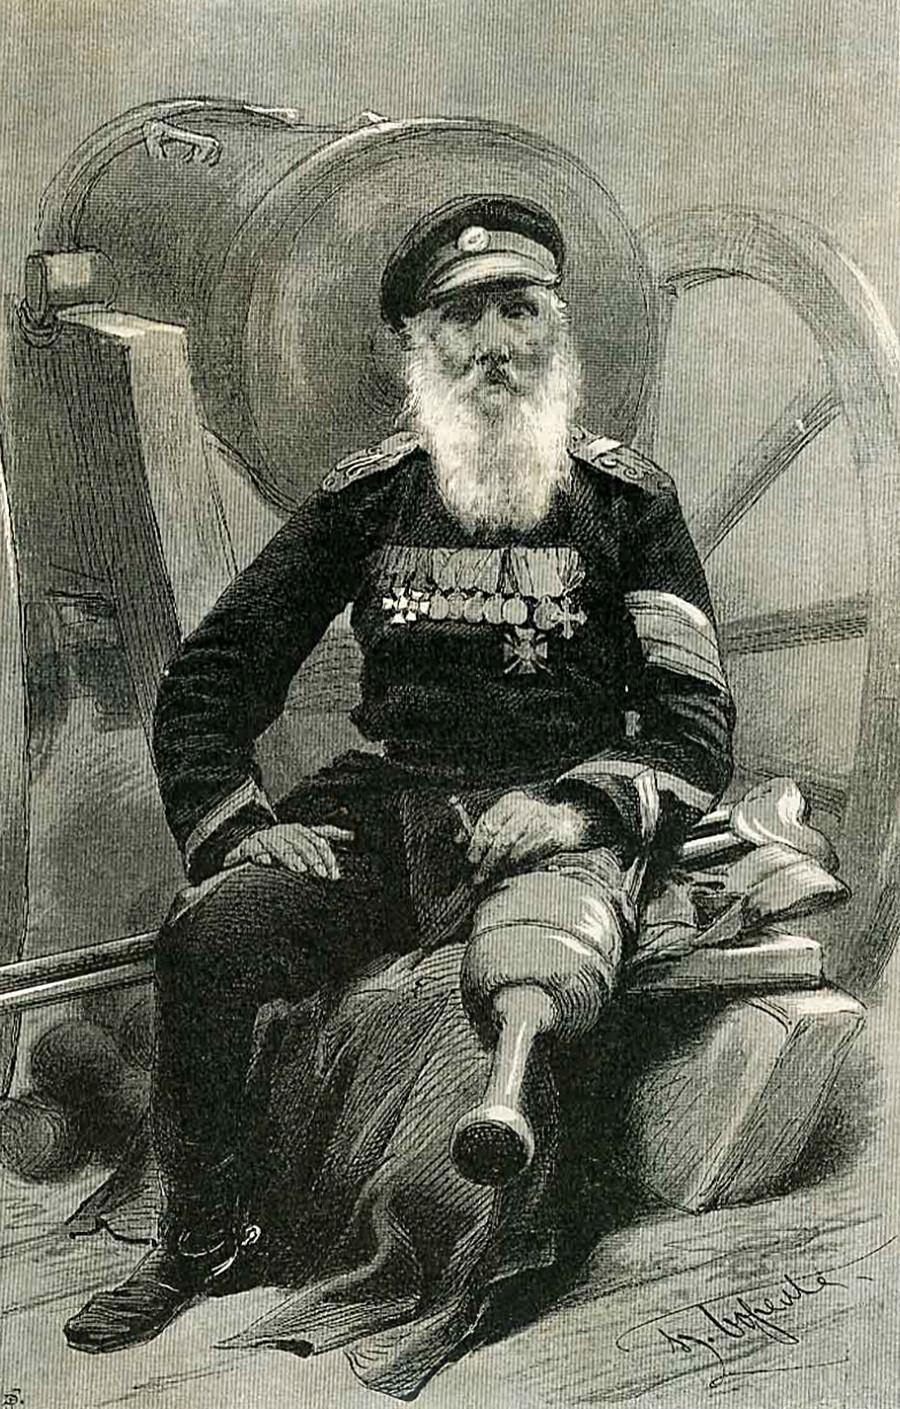 Le soldat Vassili Kotchetkov. Dessin de Piotr Borel. Vsemirnaïa illioustratsia n°1249 en date du 1 janvier 1893